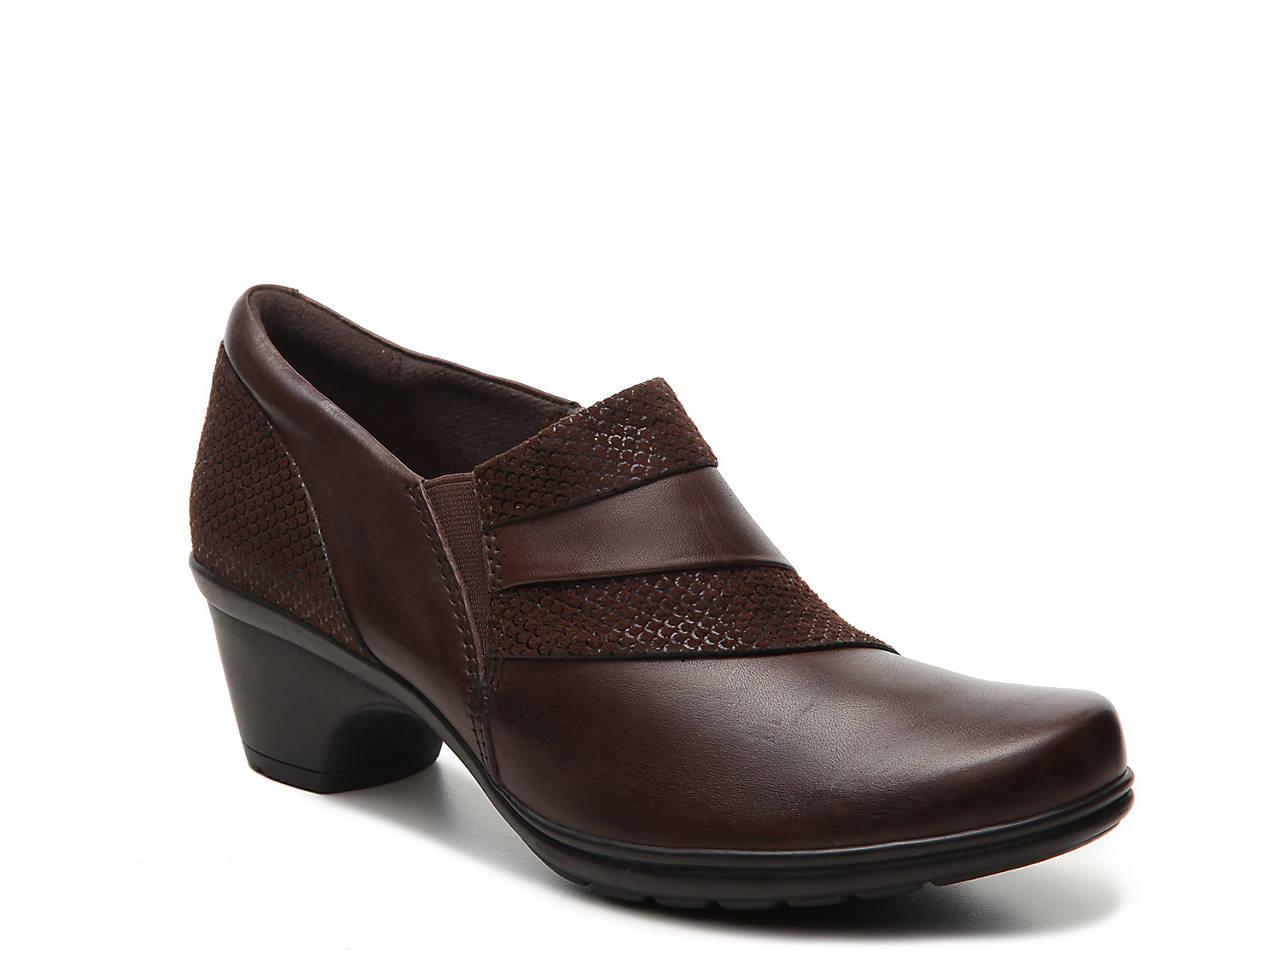 16b444c4b8d7 Earth Origins Reegan Bootie Women s Shoes